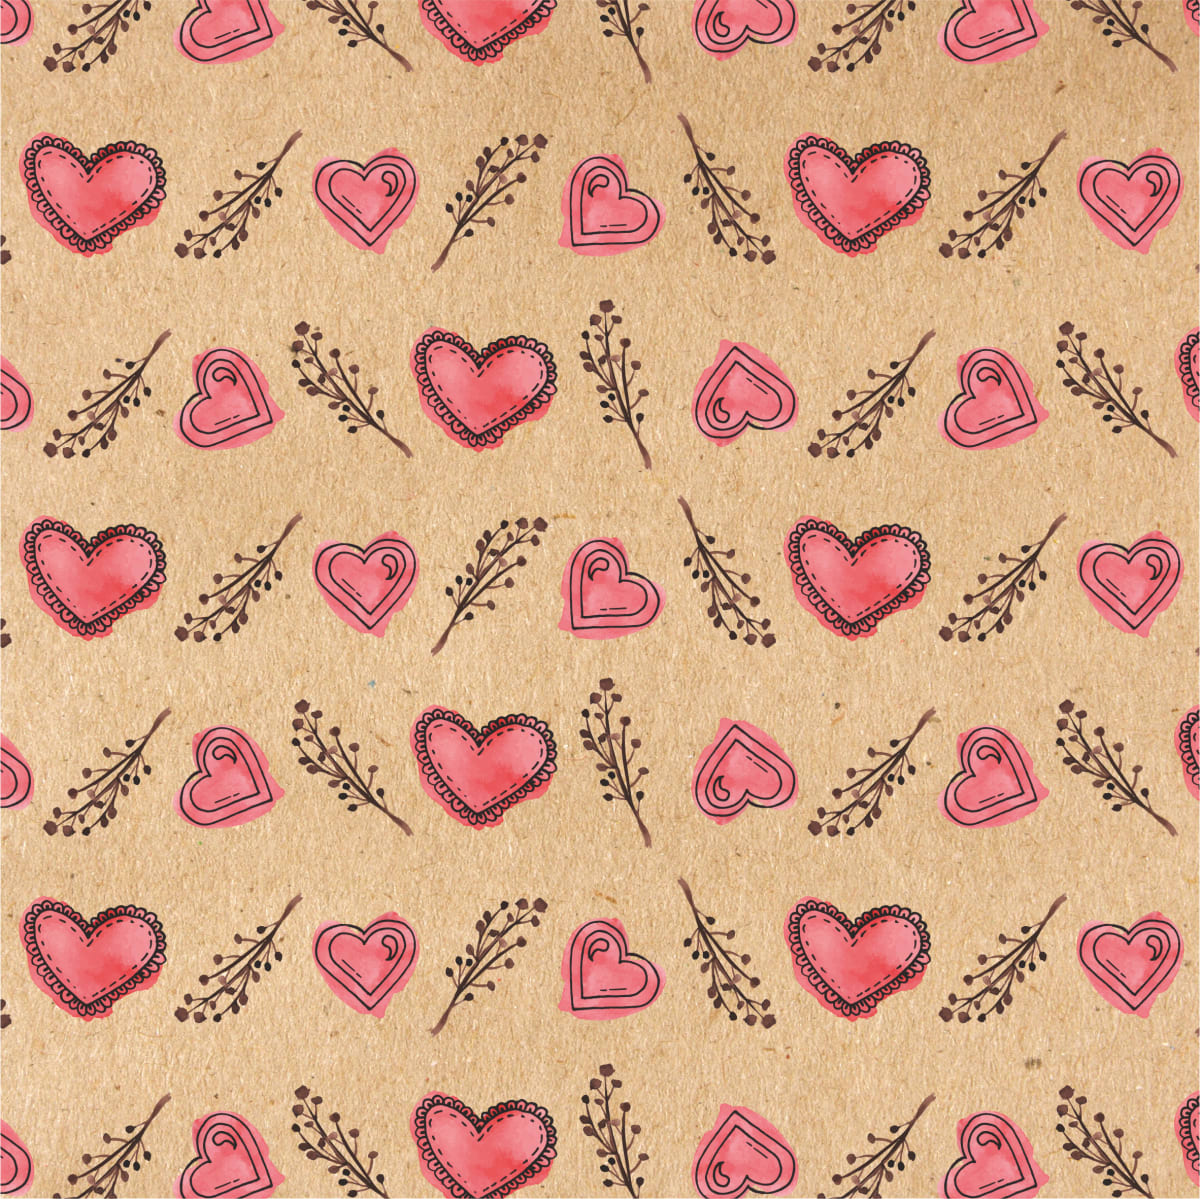 Бумага упаковочная крафт «Сердечки» 50х70/2 листа